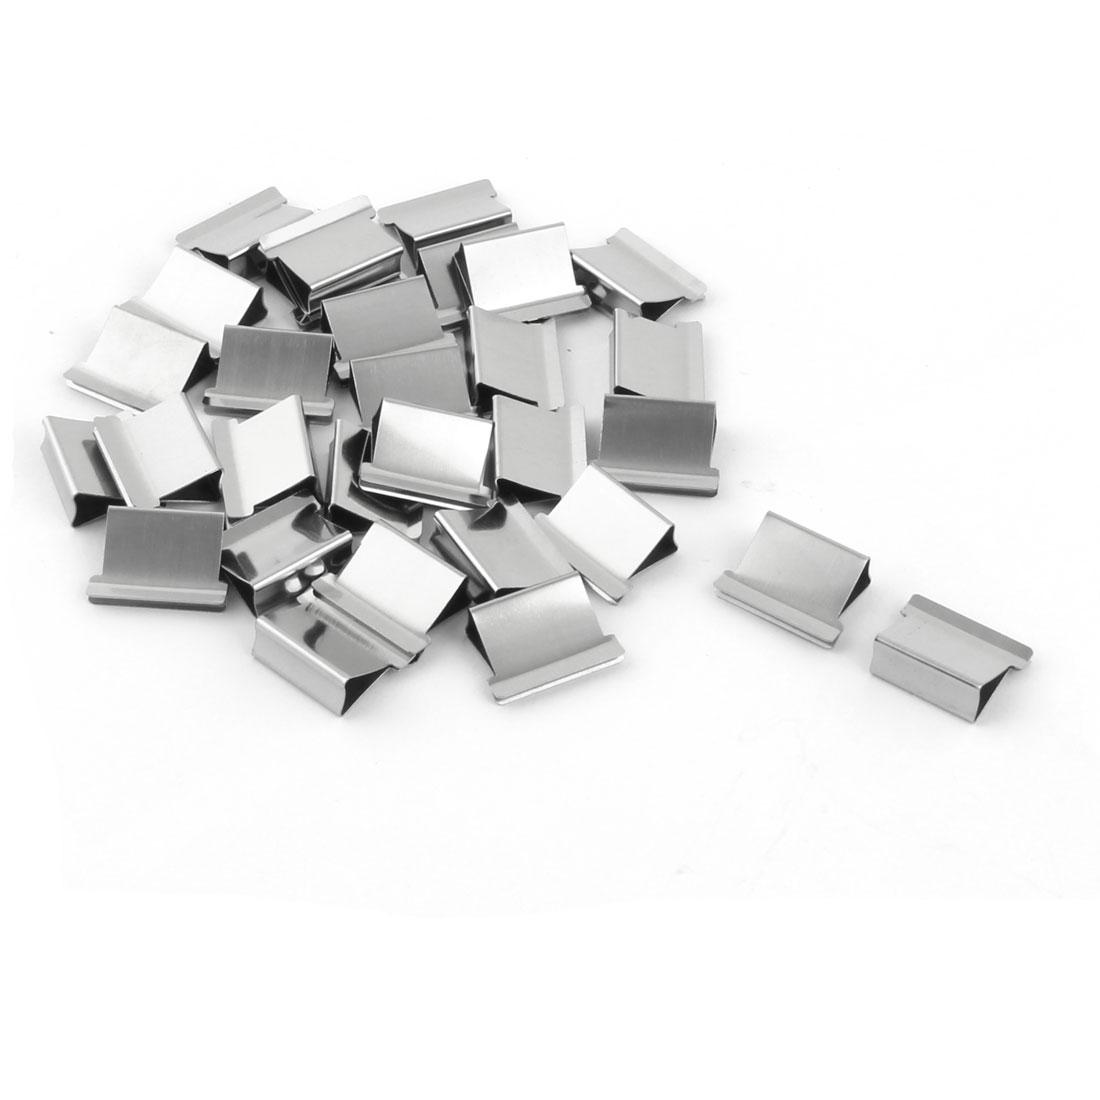 School Office Reusable Fast Clamp Clip Dispenser Refills Silver Tone 30pcs